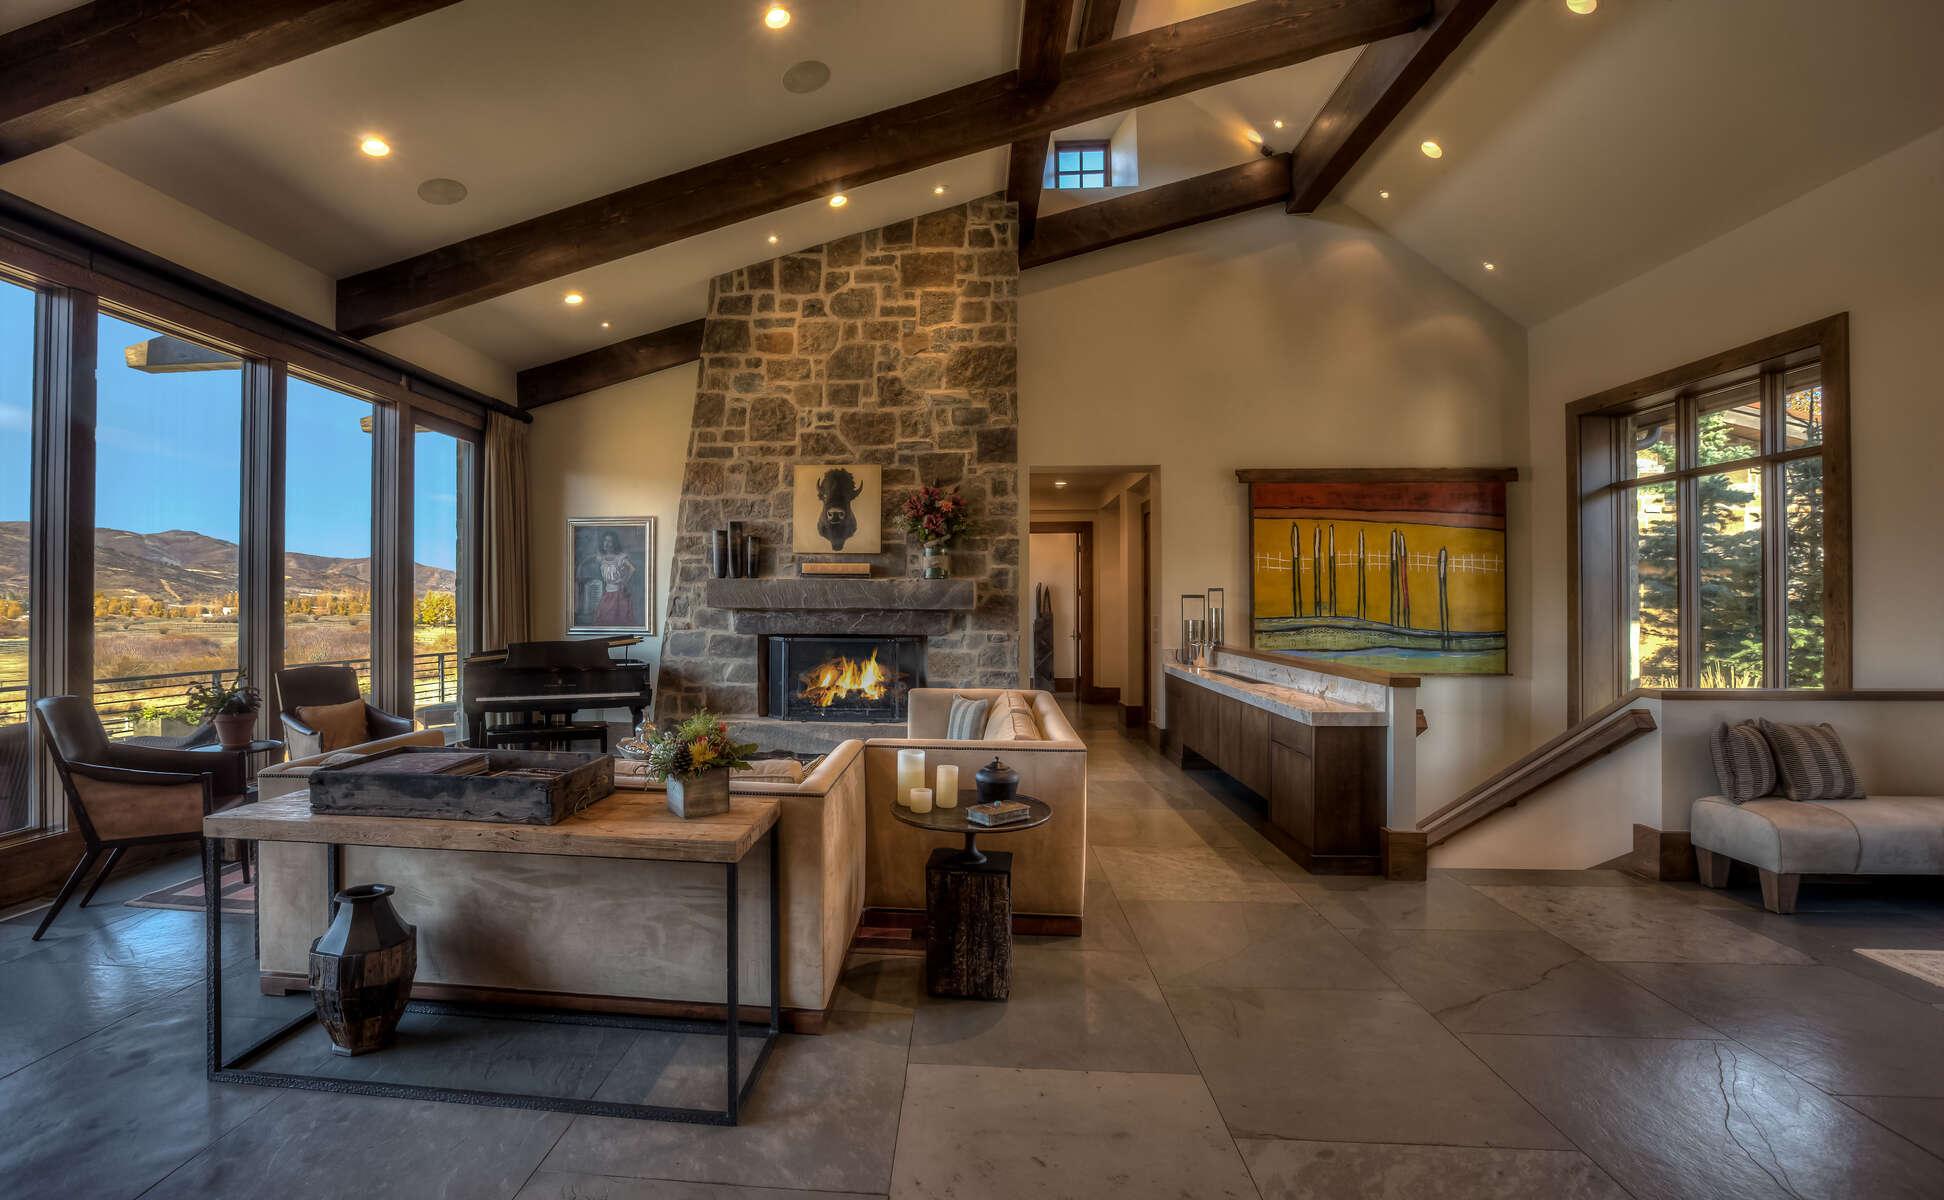 Hadley-3410-08-_E0E0125_Living-Room-to-Fireplace-2-Pano